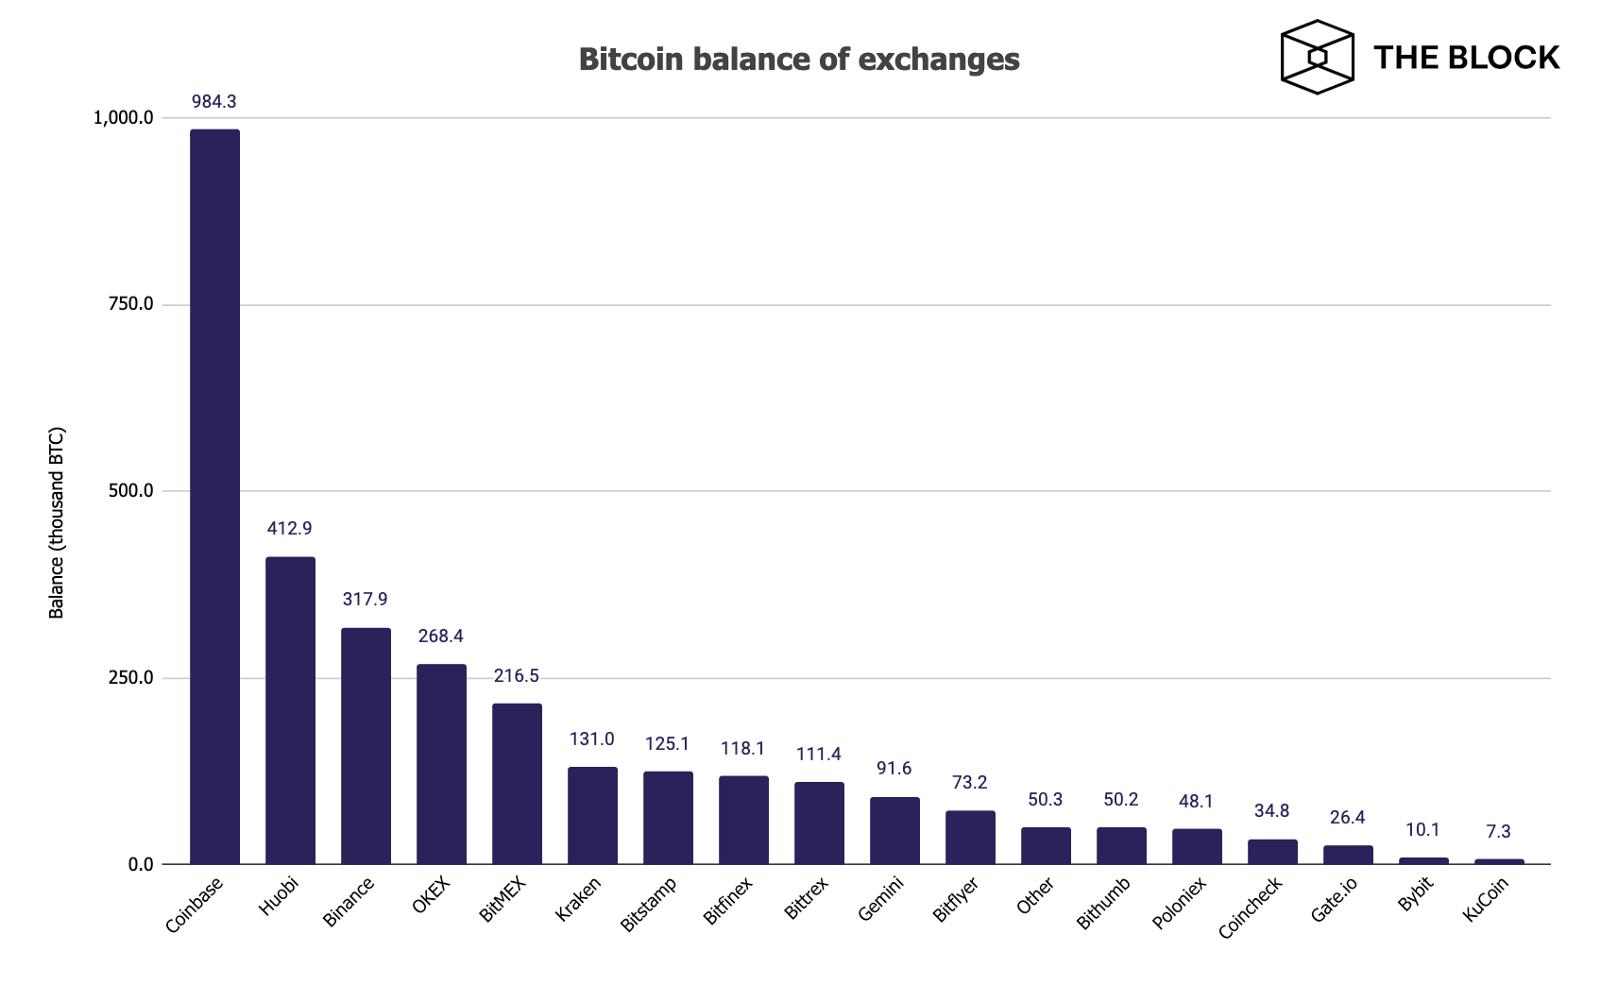 The Block назвал самую популярную биржу для хранения bitcoin